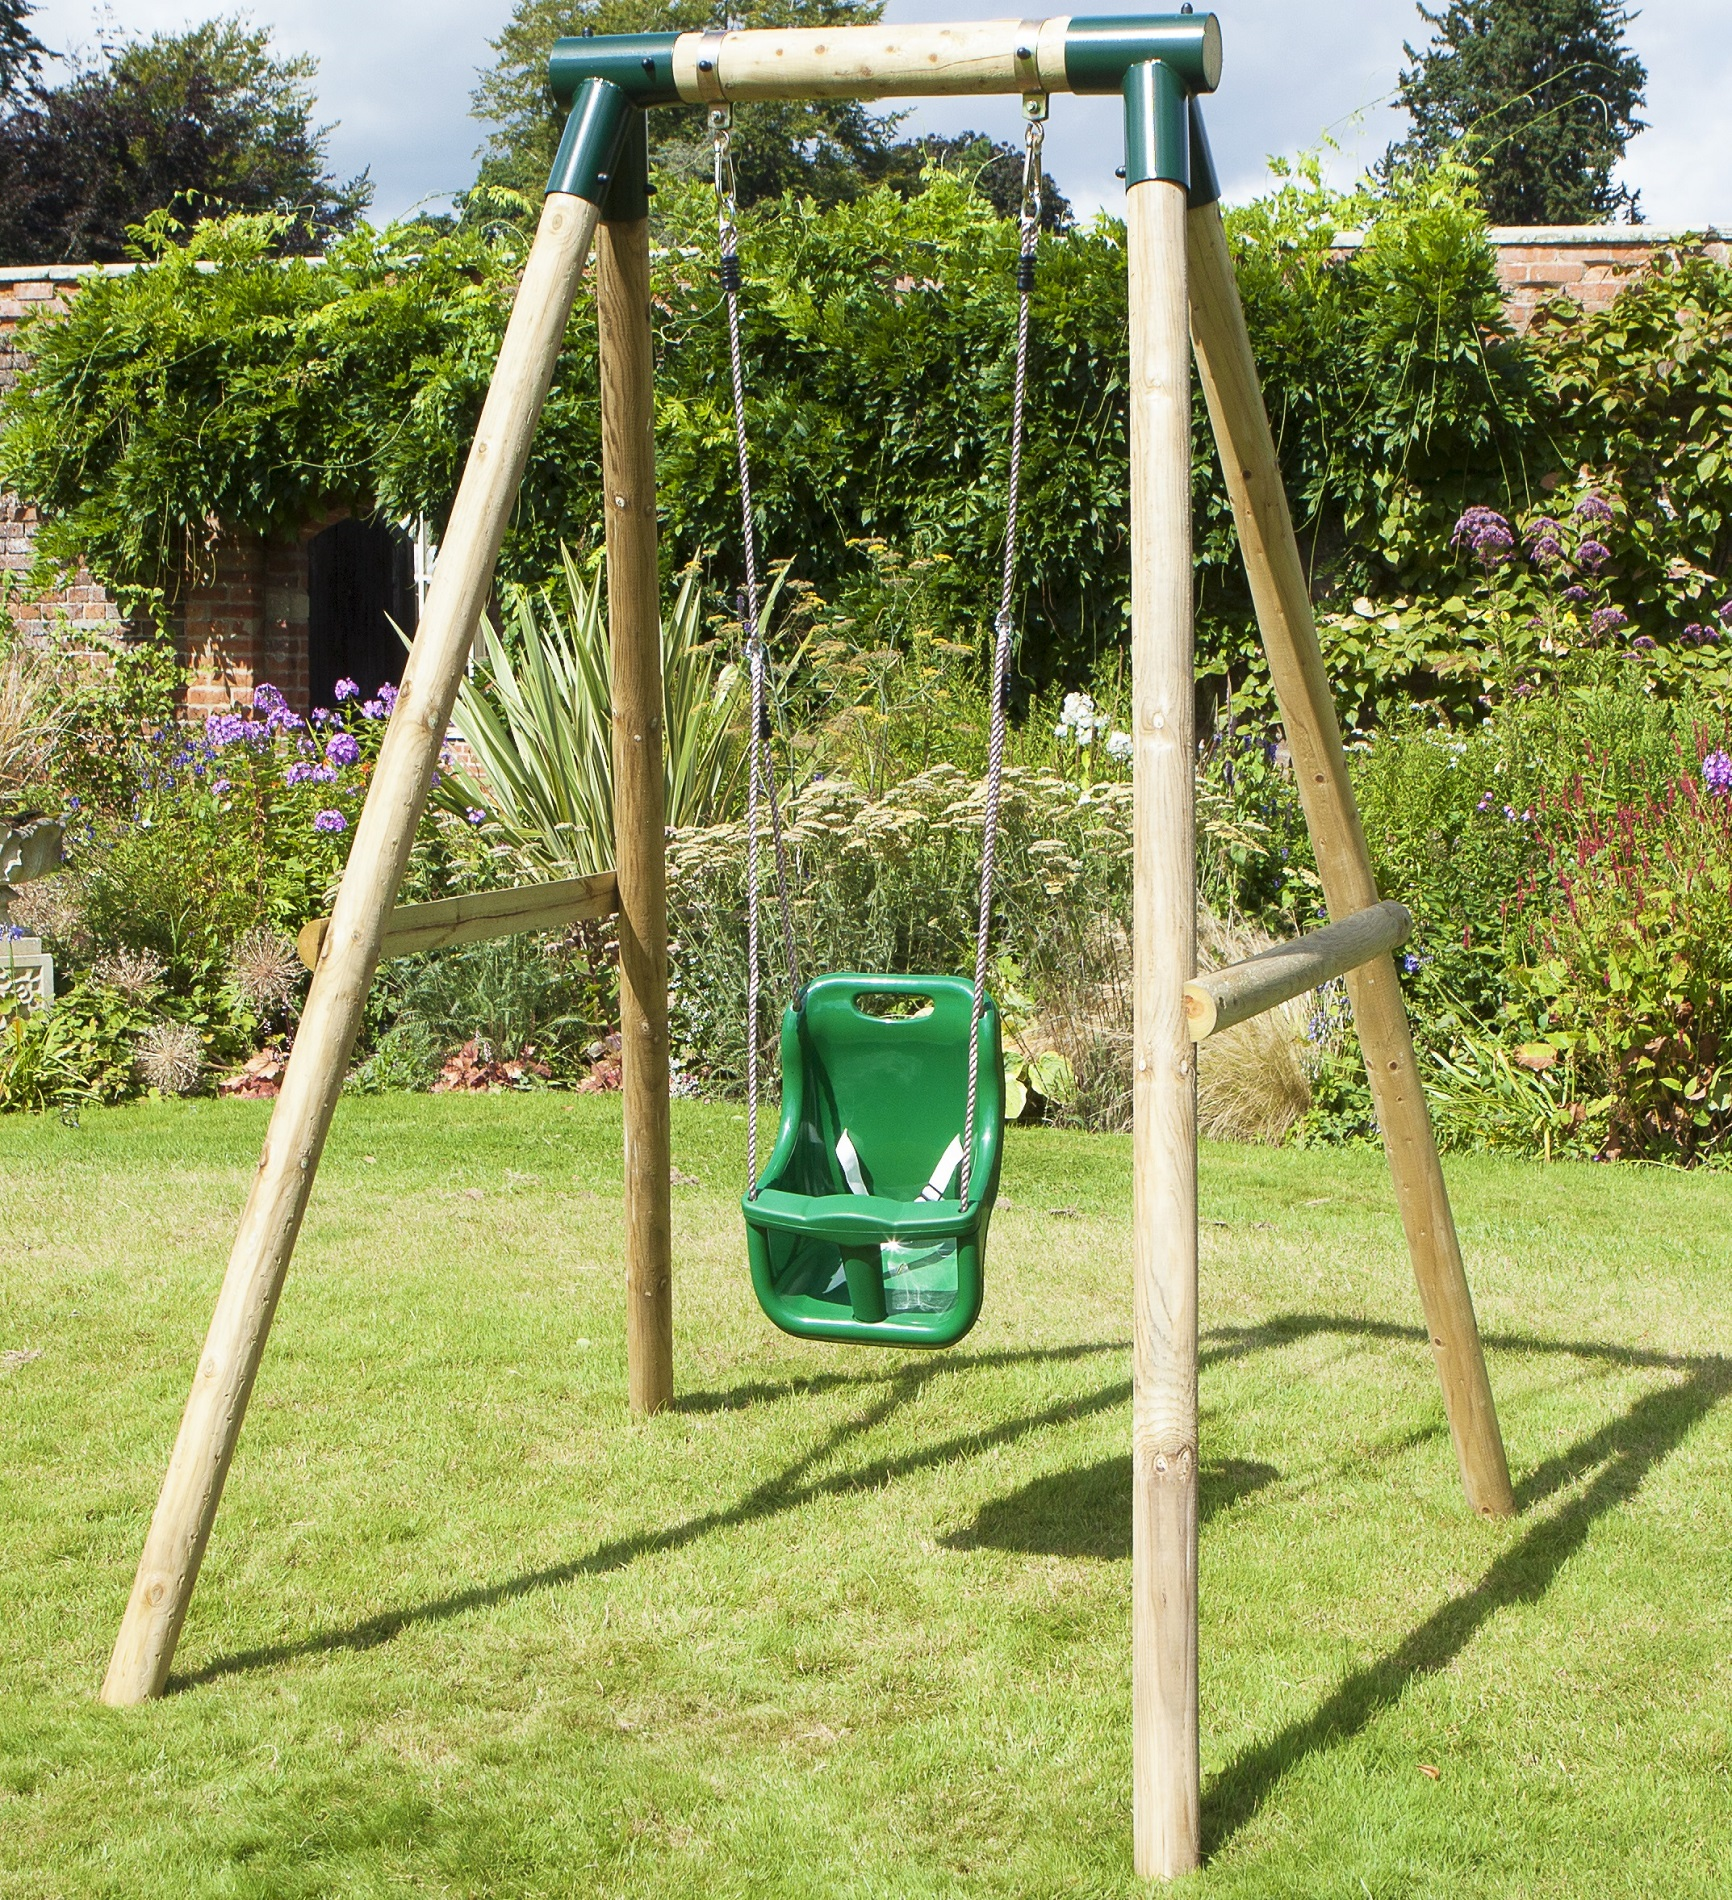 Rebo Pluto Baby Wooden Garden Swing Set- Baby Swing   eBay